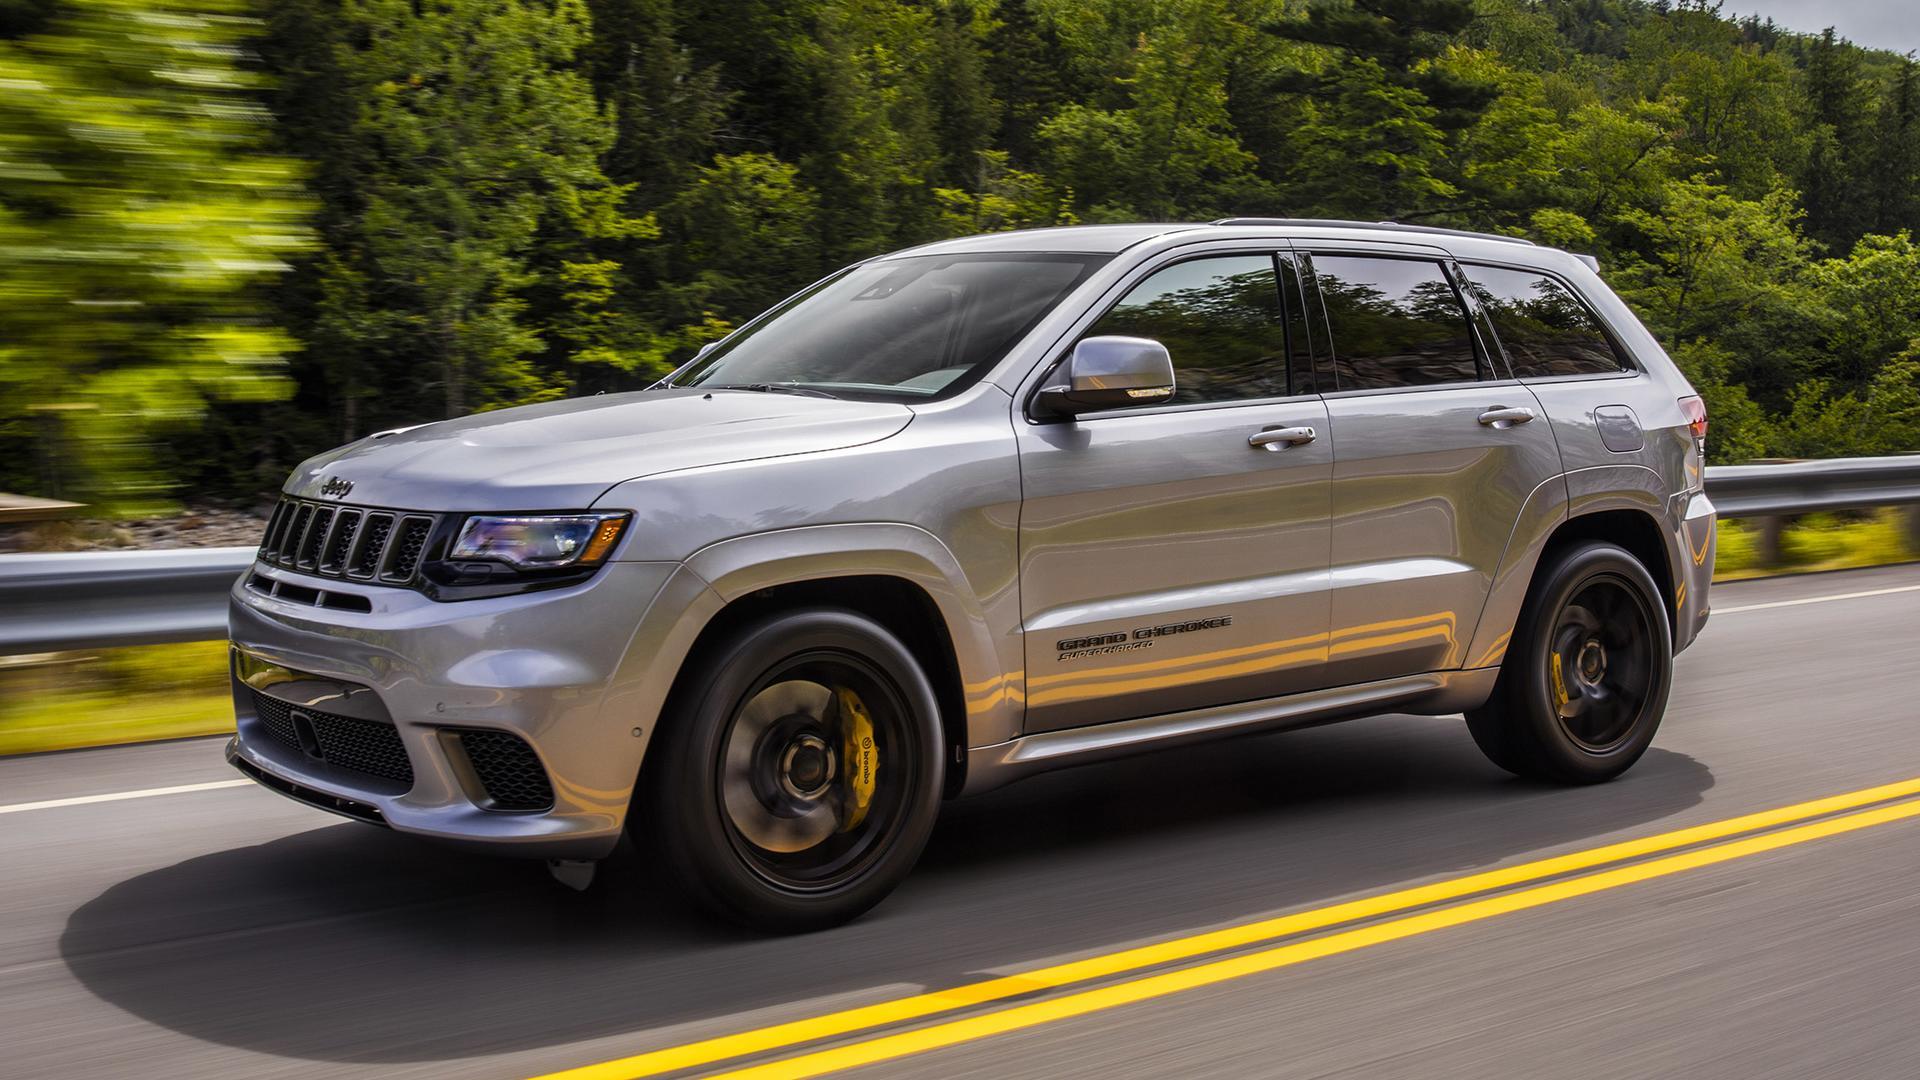 2018 Jeep Grand Cherokee Trackhawk Hellcat >> 2018 Jeep Grand Cherokee Trackhawk First Drive Hellcat All The Things